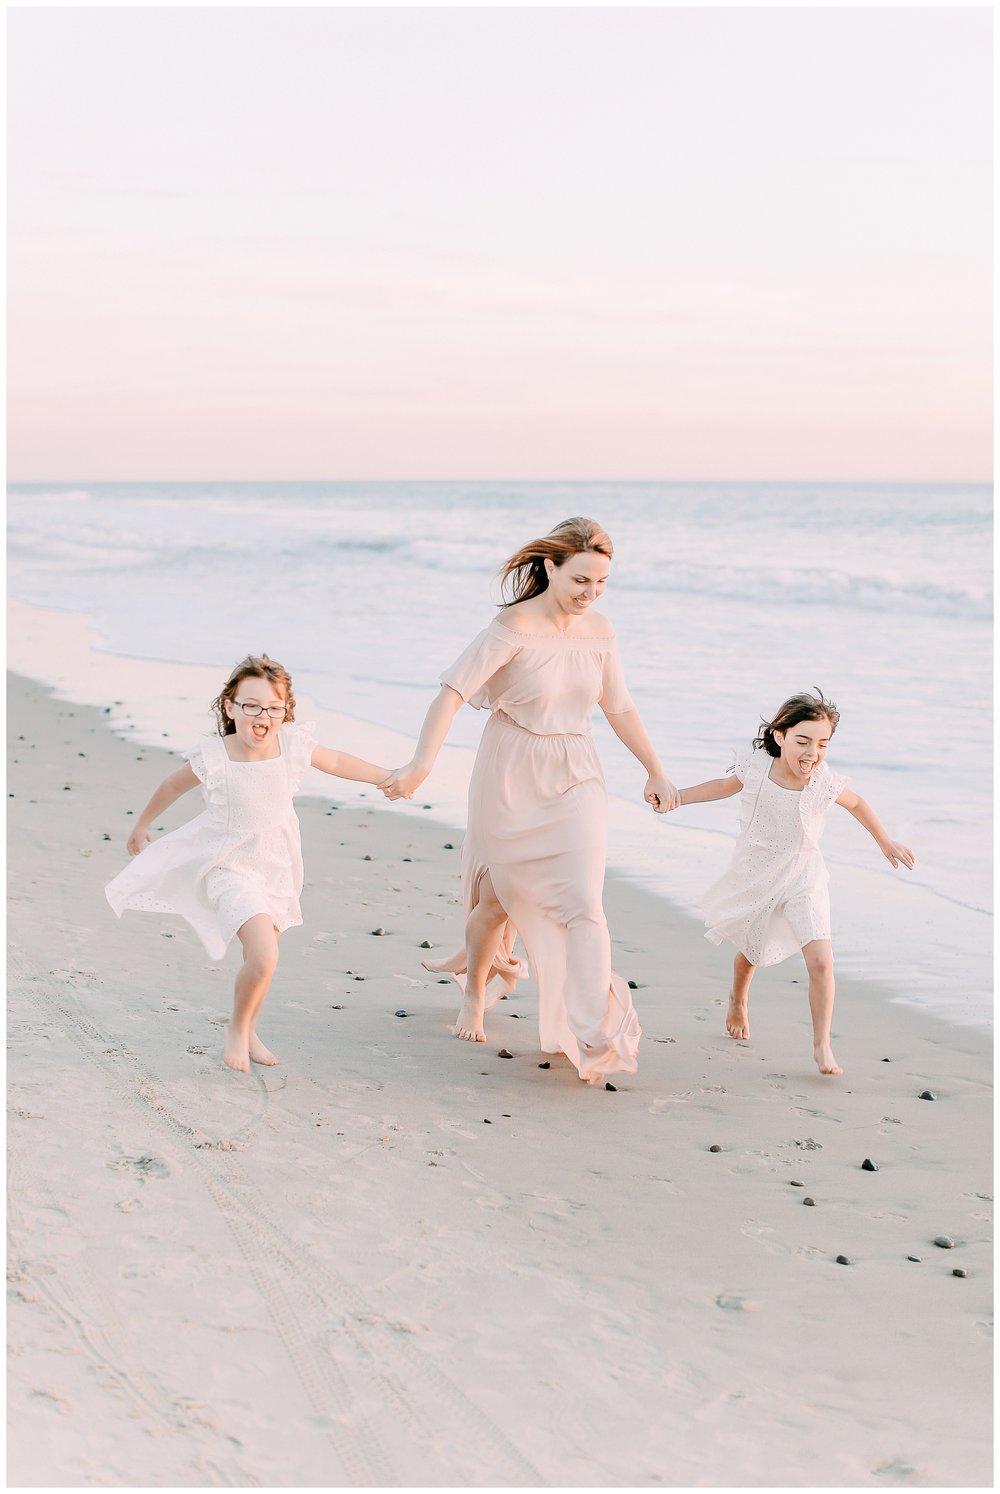 San_clemente_family_session_Orange_county_family_photographer_cori_kleckner_photography_laguna_beach_family_session_0704.jpg